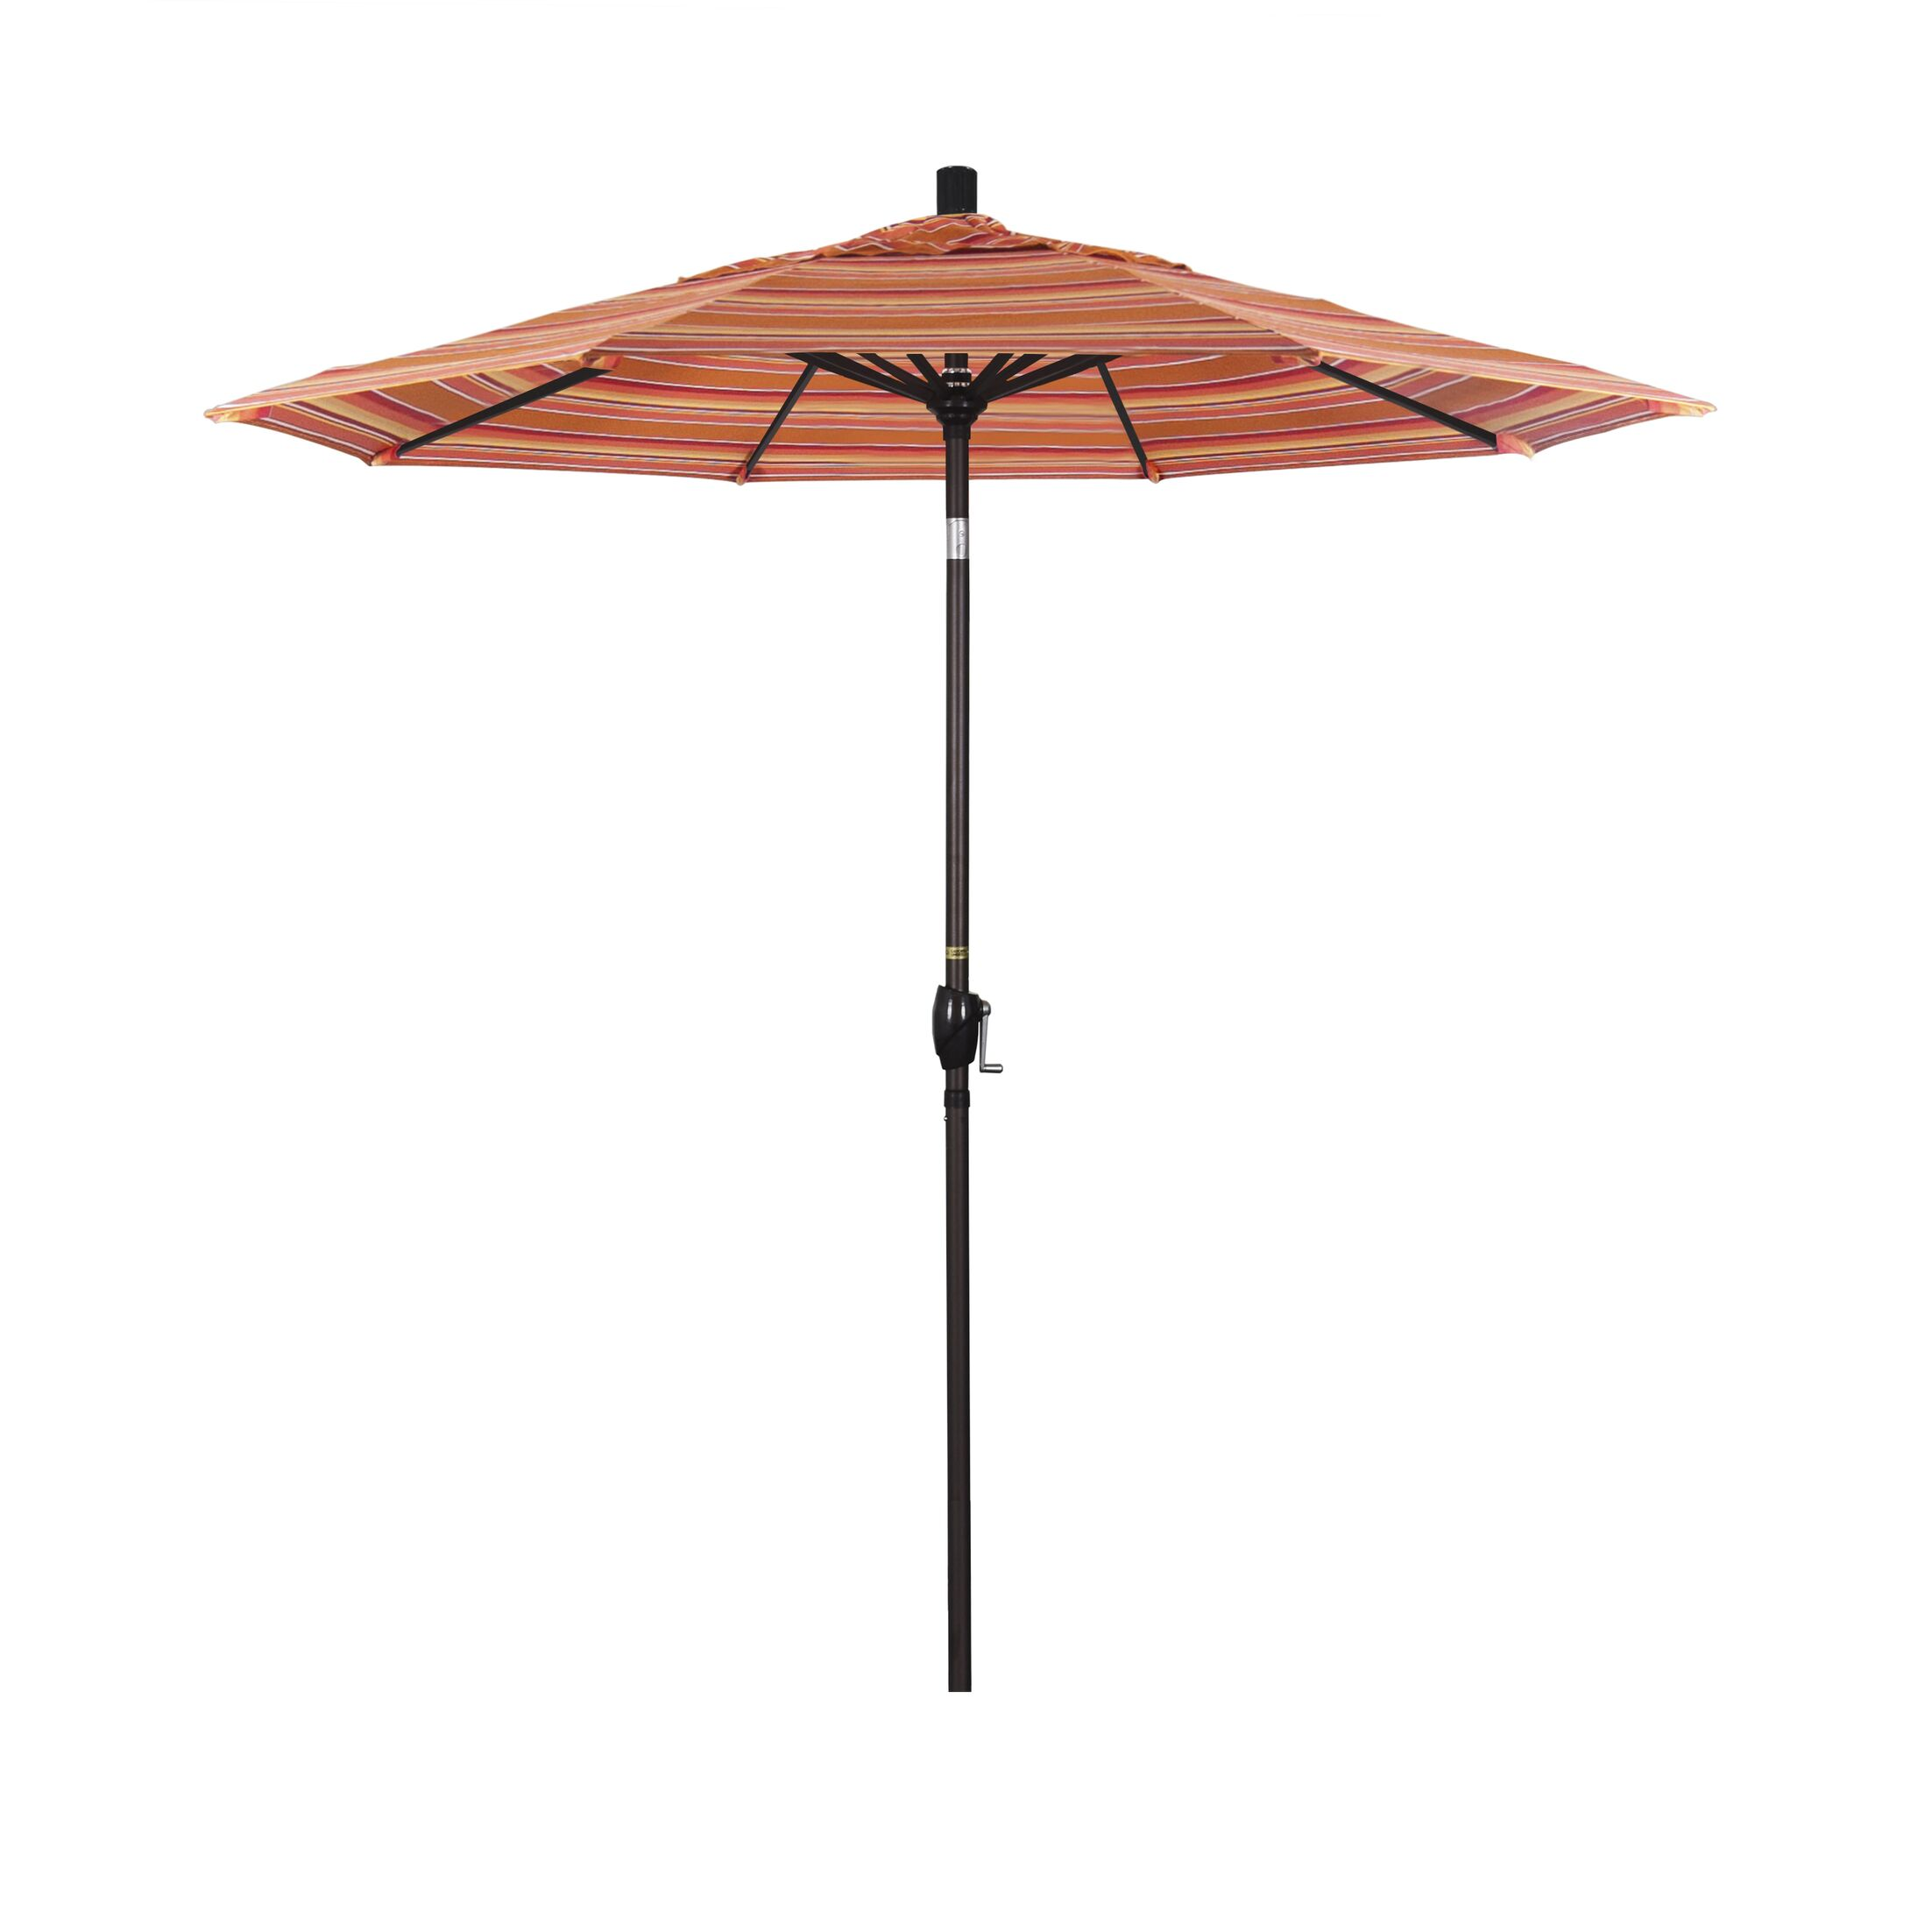 Cello 7.5' Market Umbrella Color: Dolce Oasis, Frame Finish: Bronze